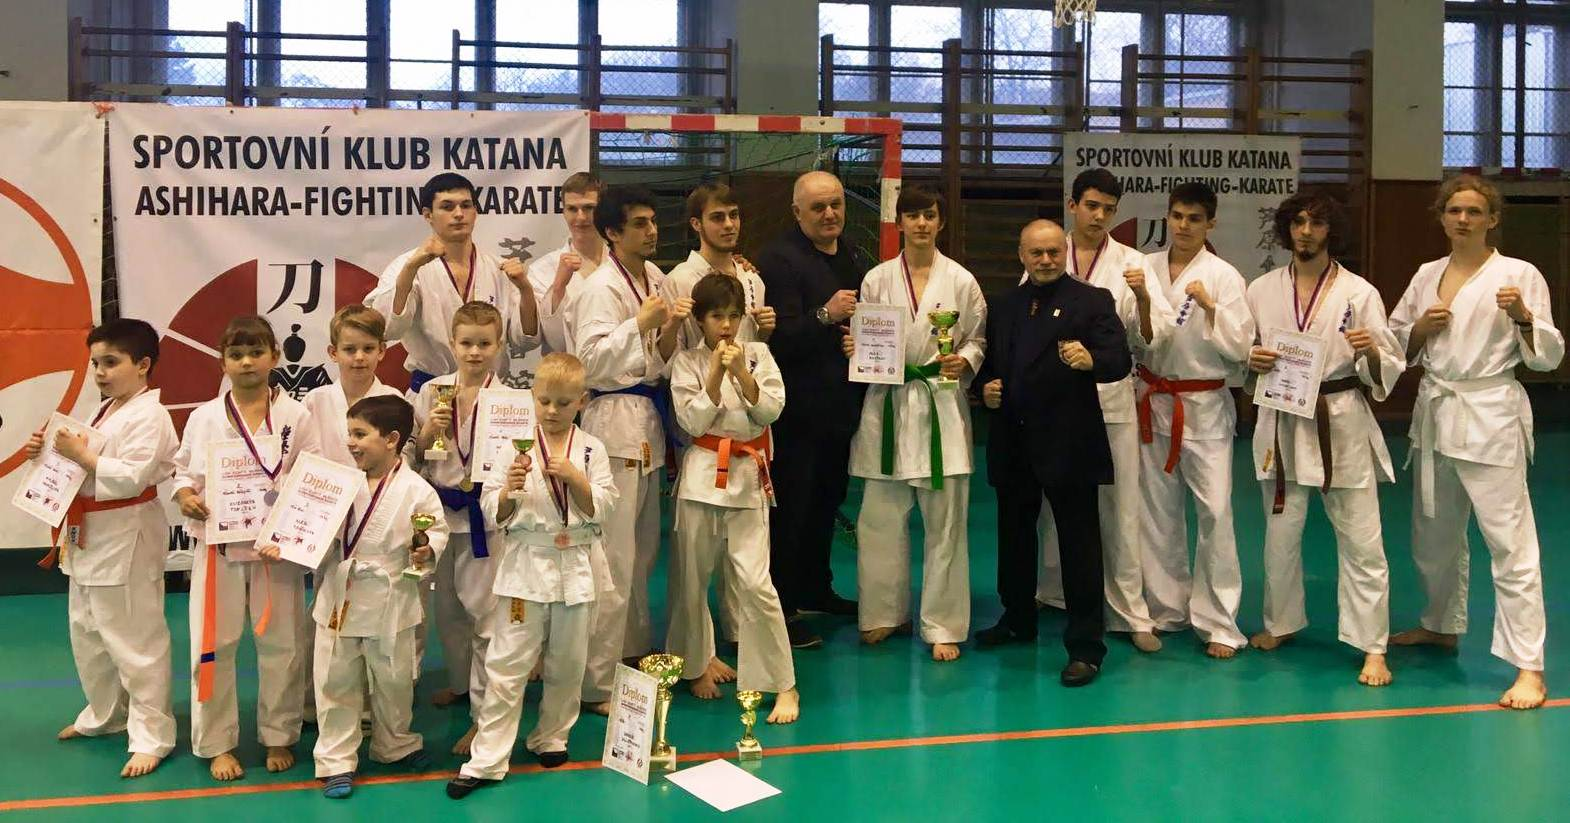 Jak dopadlo 1. kolo Ligy kumite v Shinkyokushin Karate 16. 3. 2019 v Praze